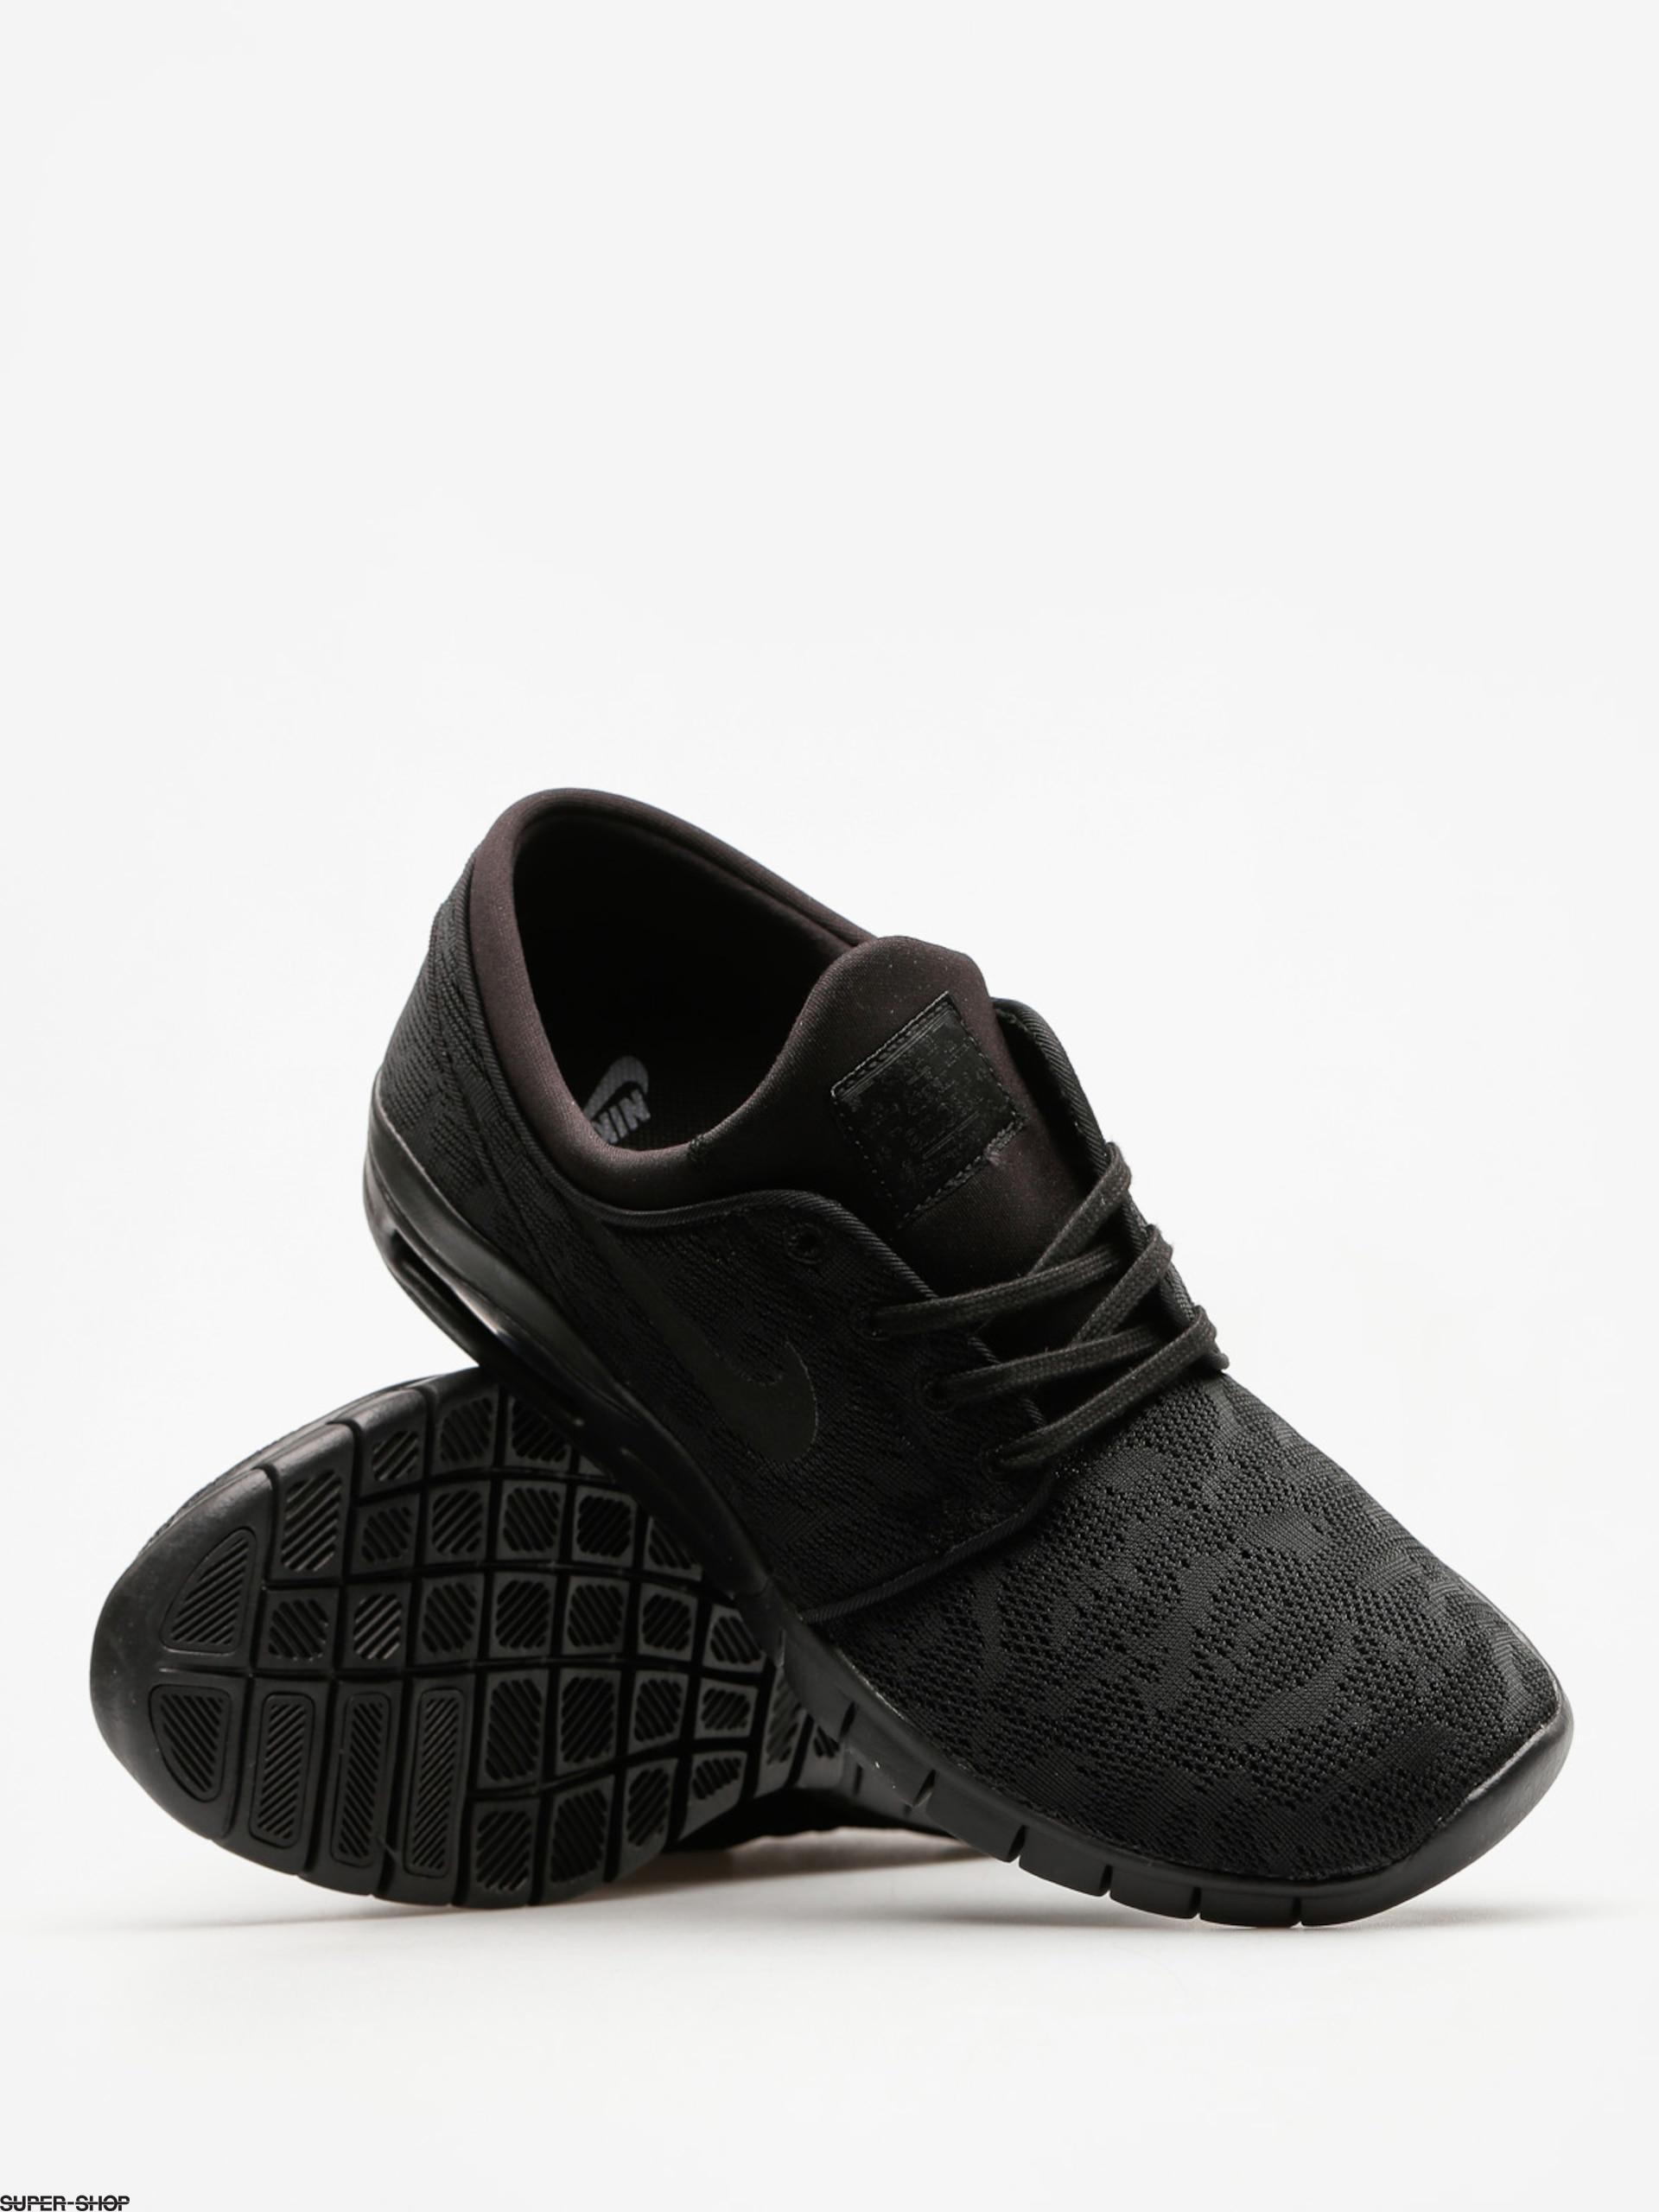 56e88abeb Nike SB Shoes Sb Stefan Janoski Max (black black anthracite)